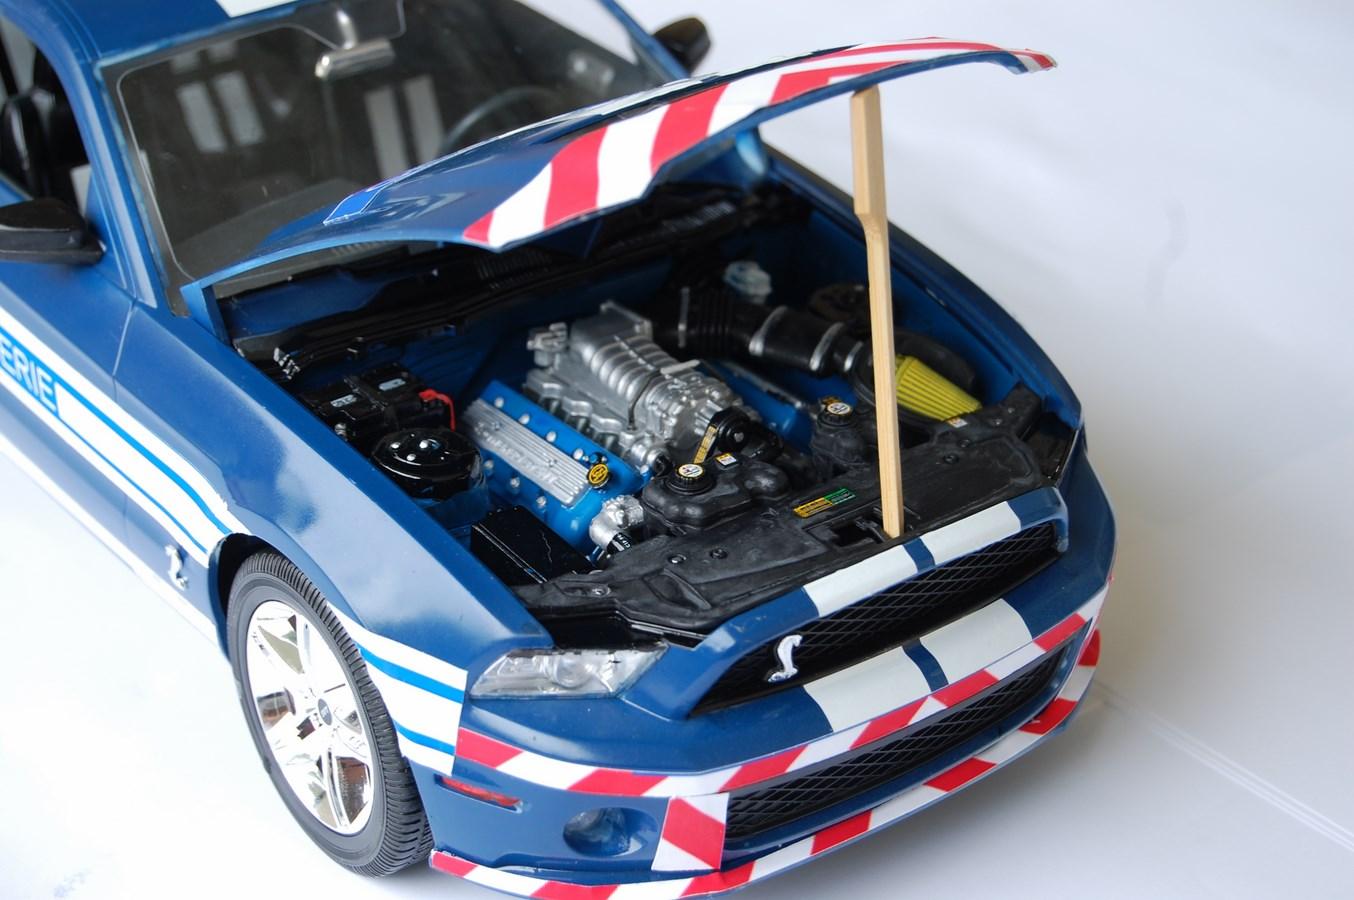 Shelby GT 500 version imaginaire Gendarmerie - Page 2 203030Mustang46Copier